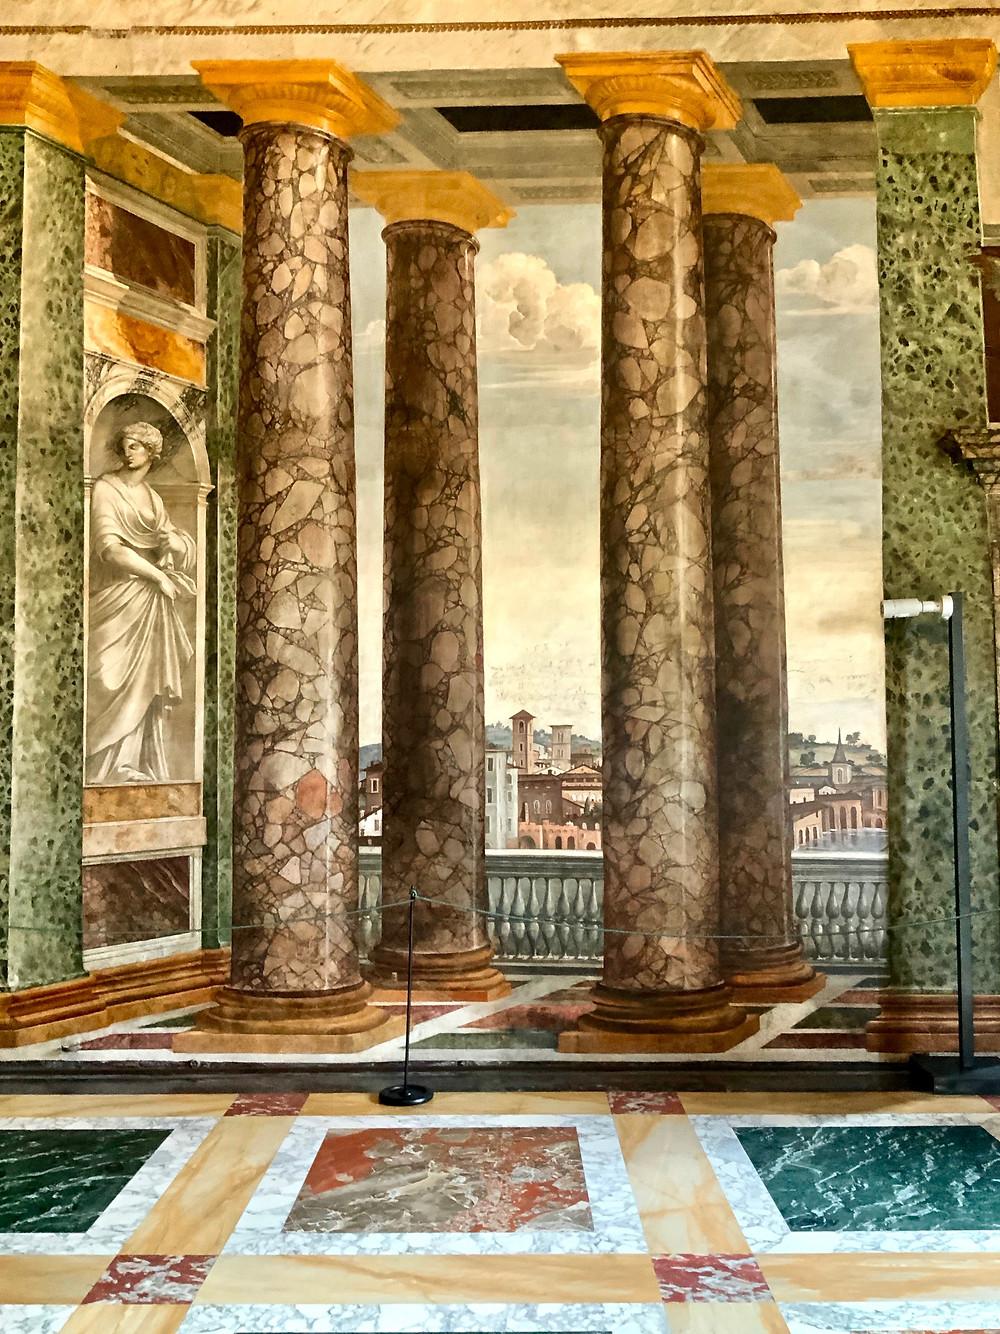 Room of the Perspectives in Villa Farnesina